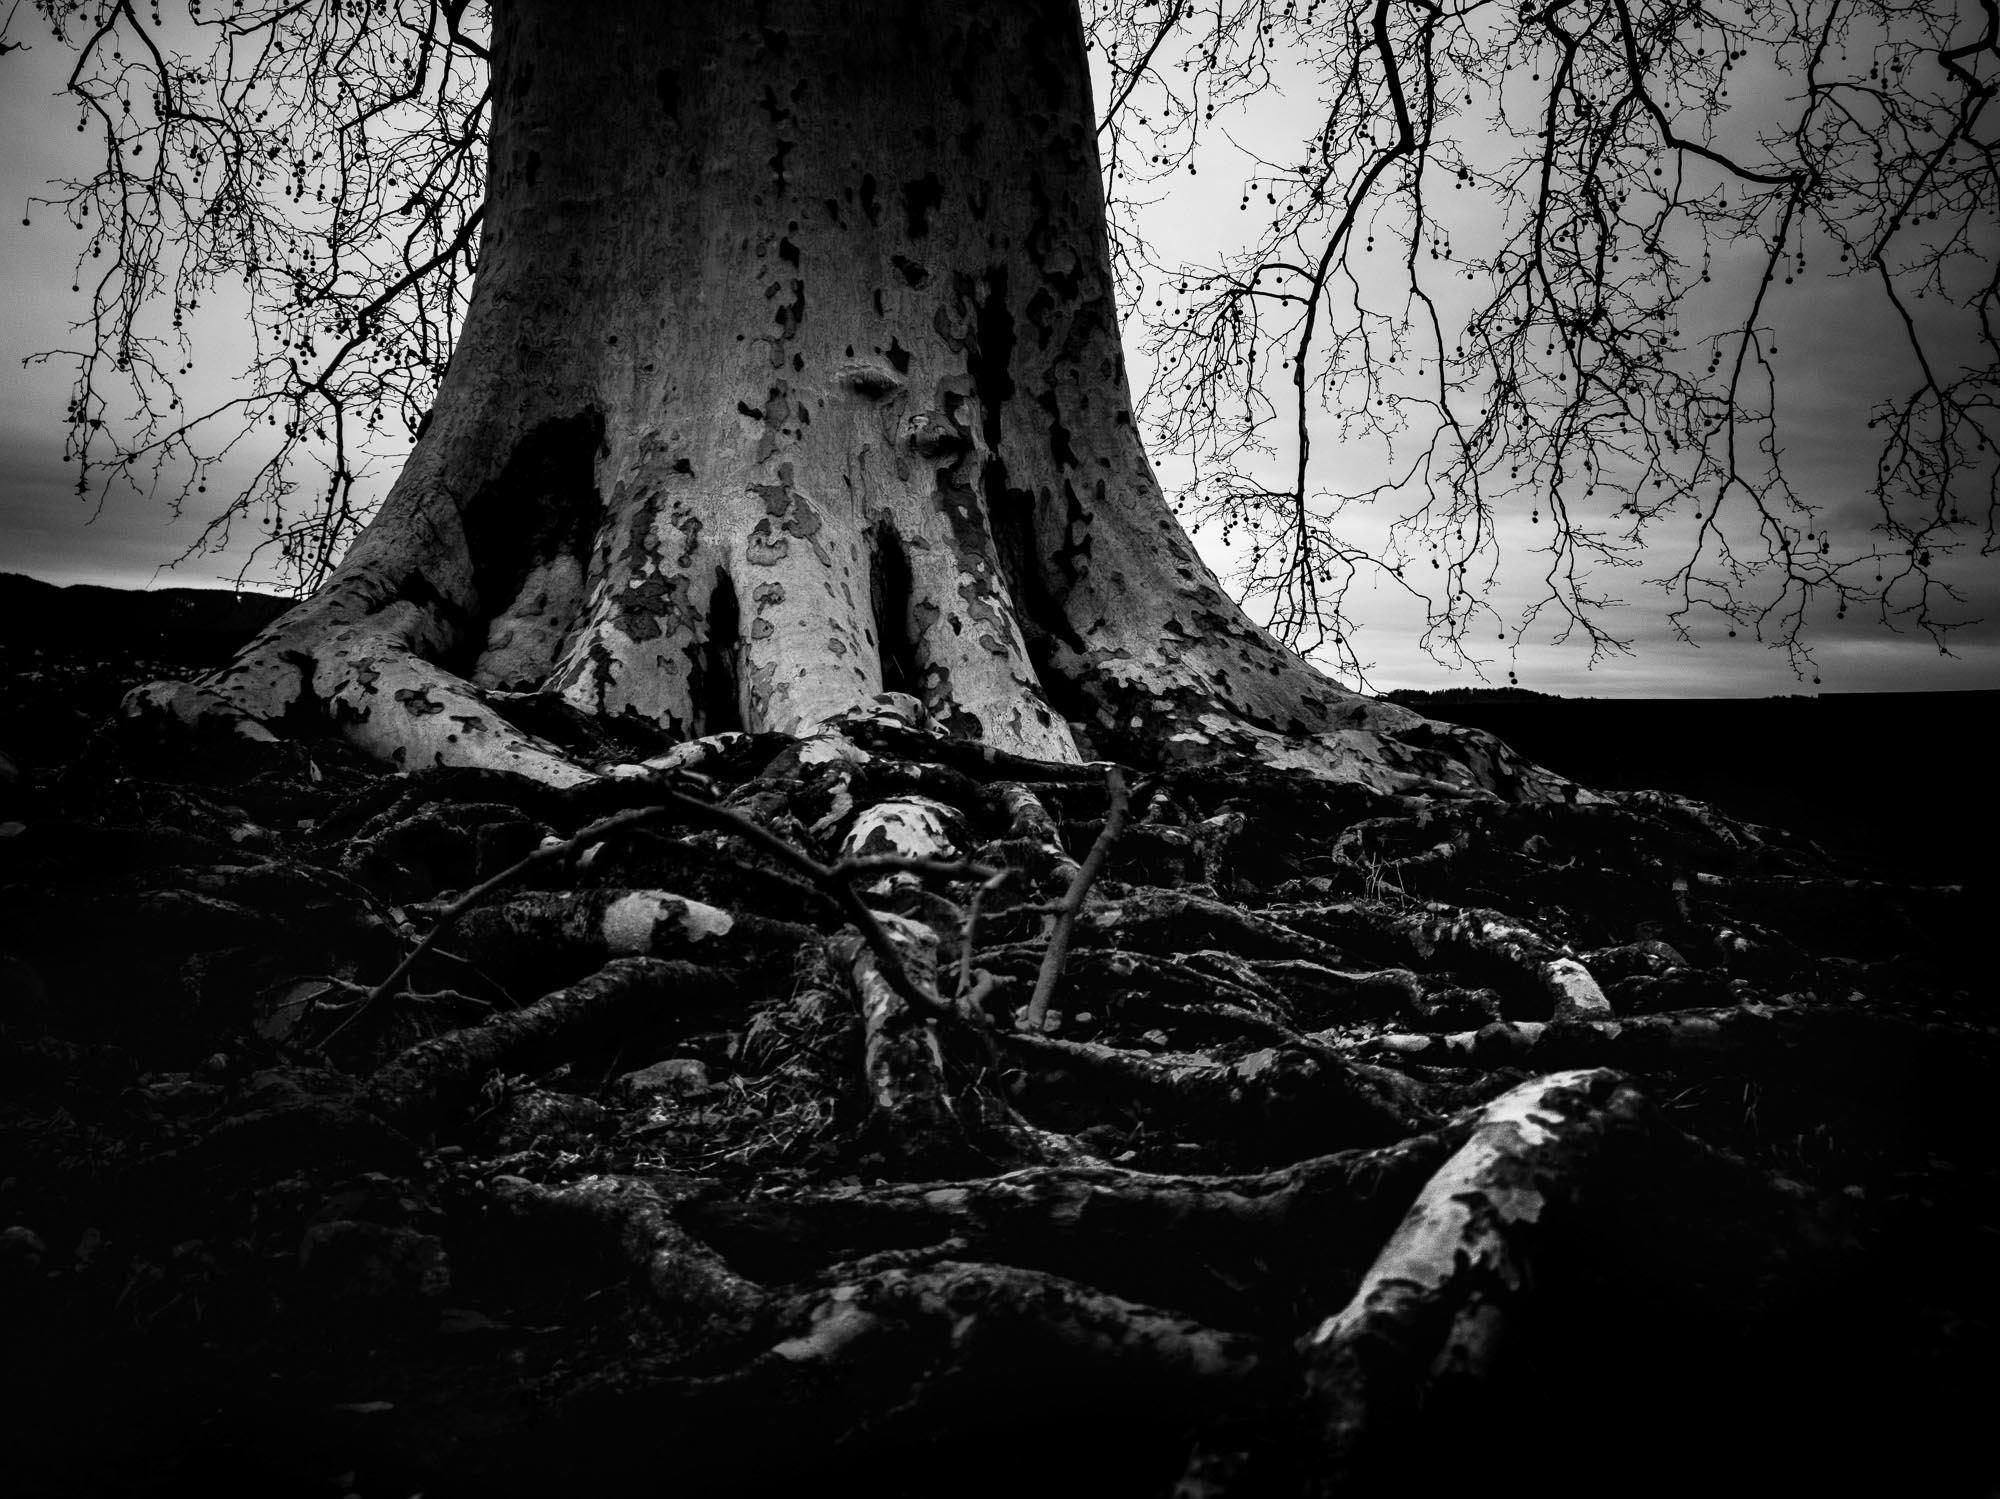 schneehaesli / Roots